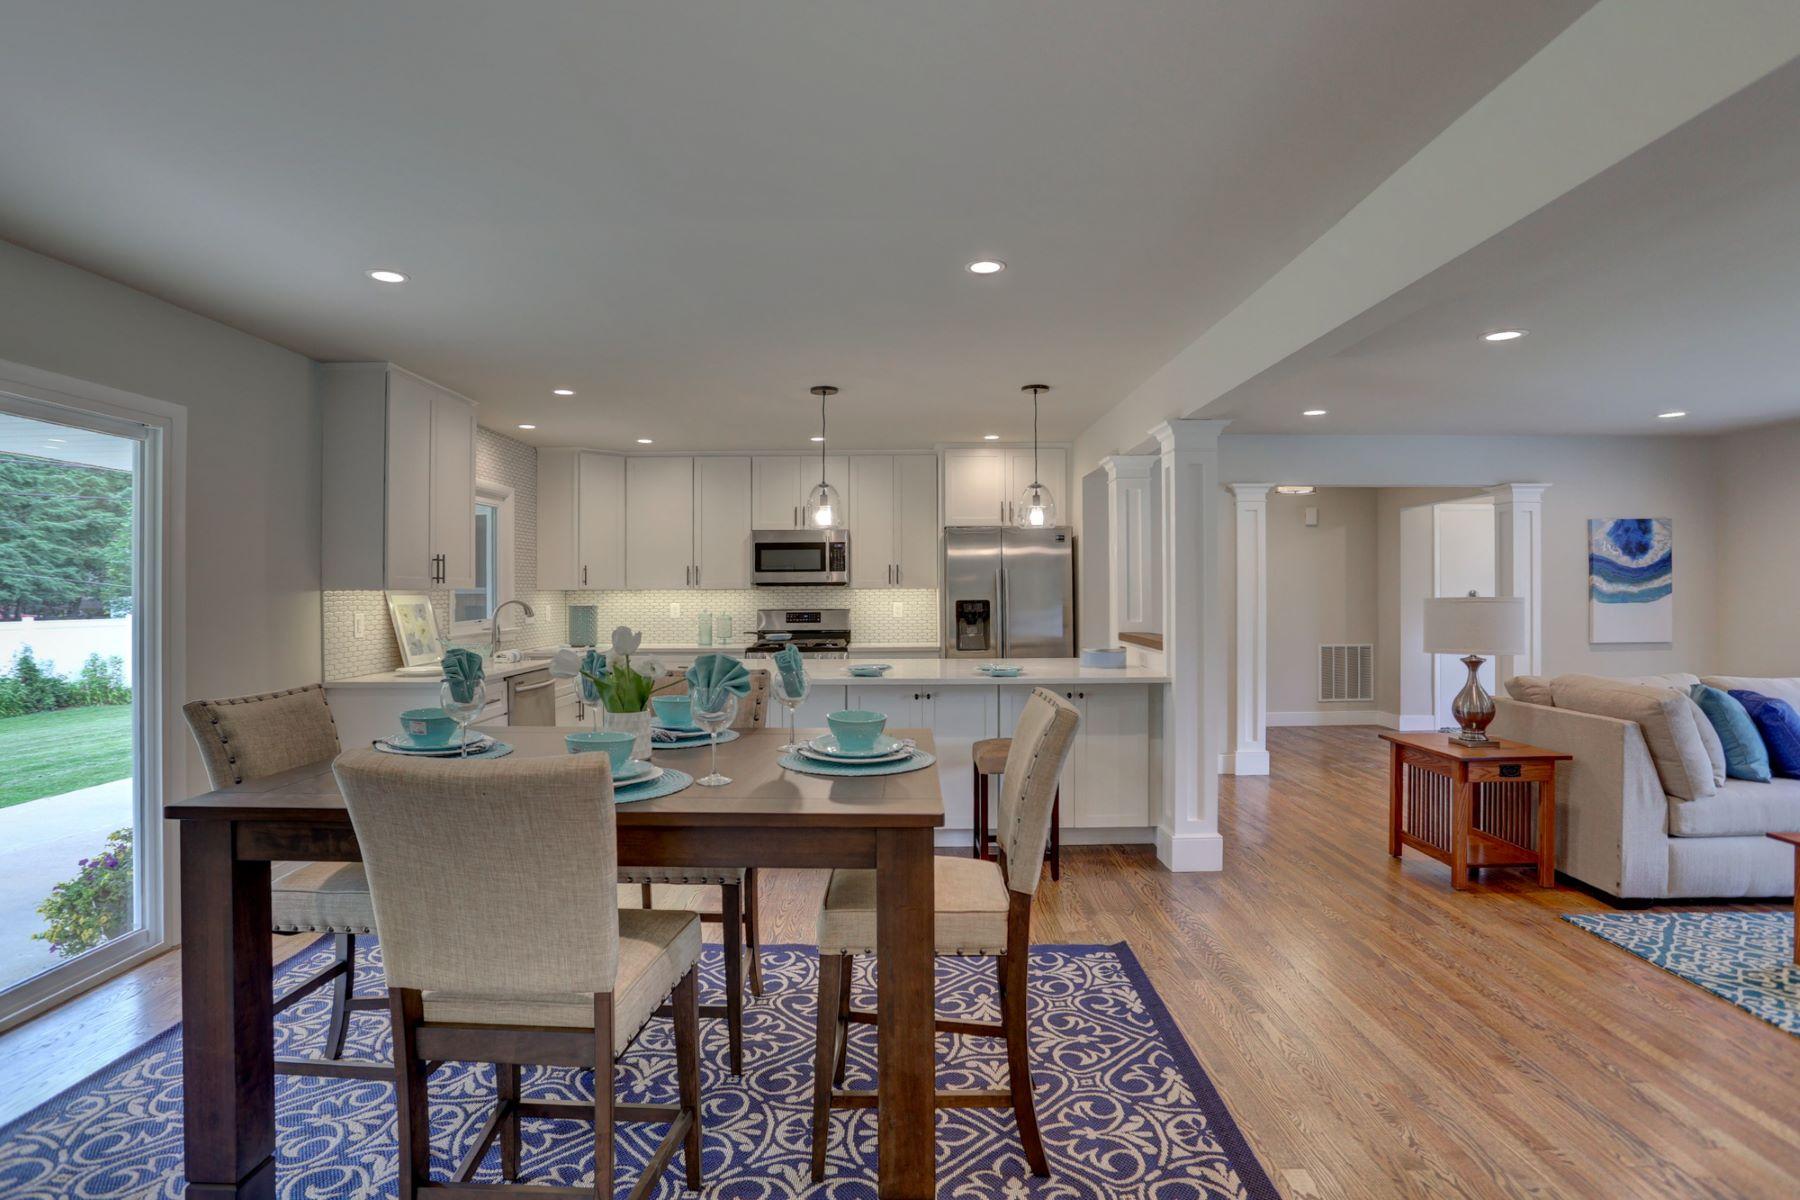 Additional photo for property listing at 19 Sunrise Avenue 19 Sunrise Avenue Lancaster, Pennsylvania 17601 United States